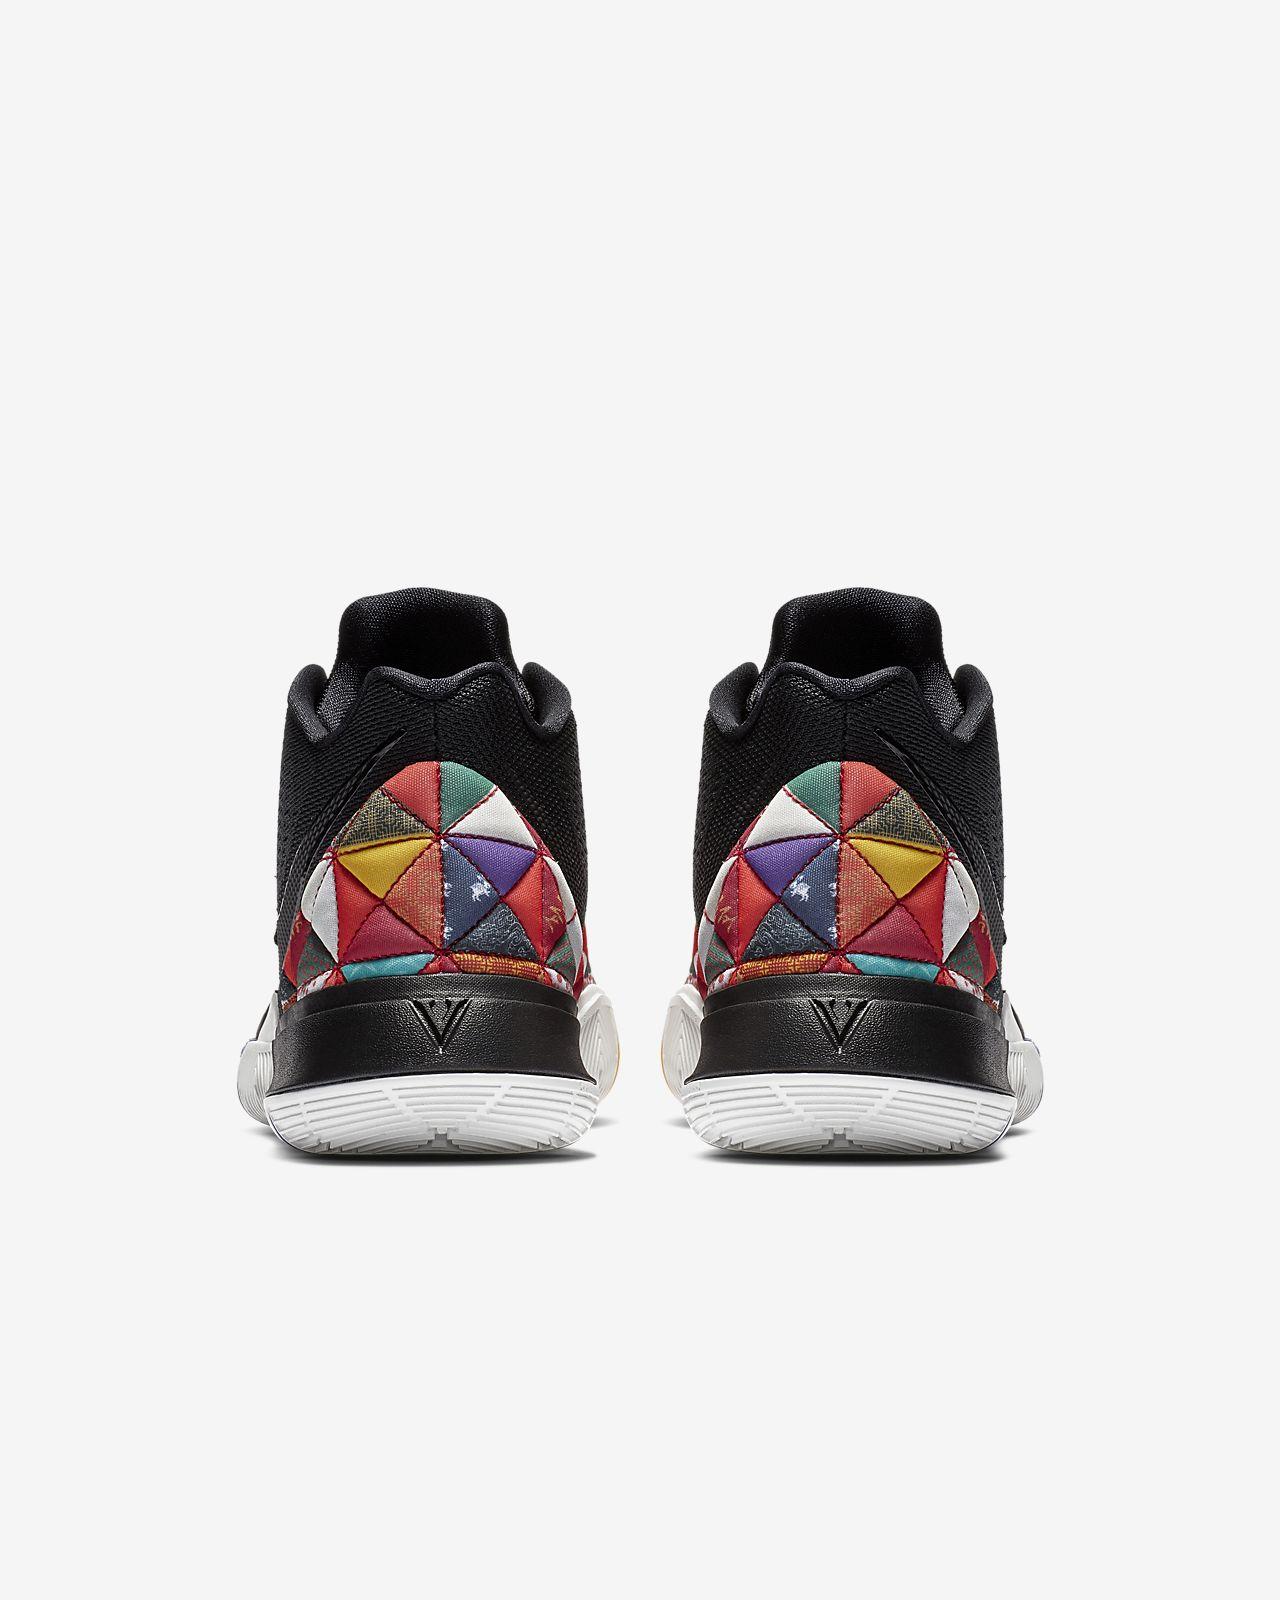 buy cheap 8ed01 860e8 ... Kyrie 5 CNY Basketball Shoe